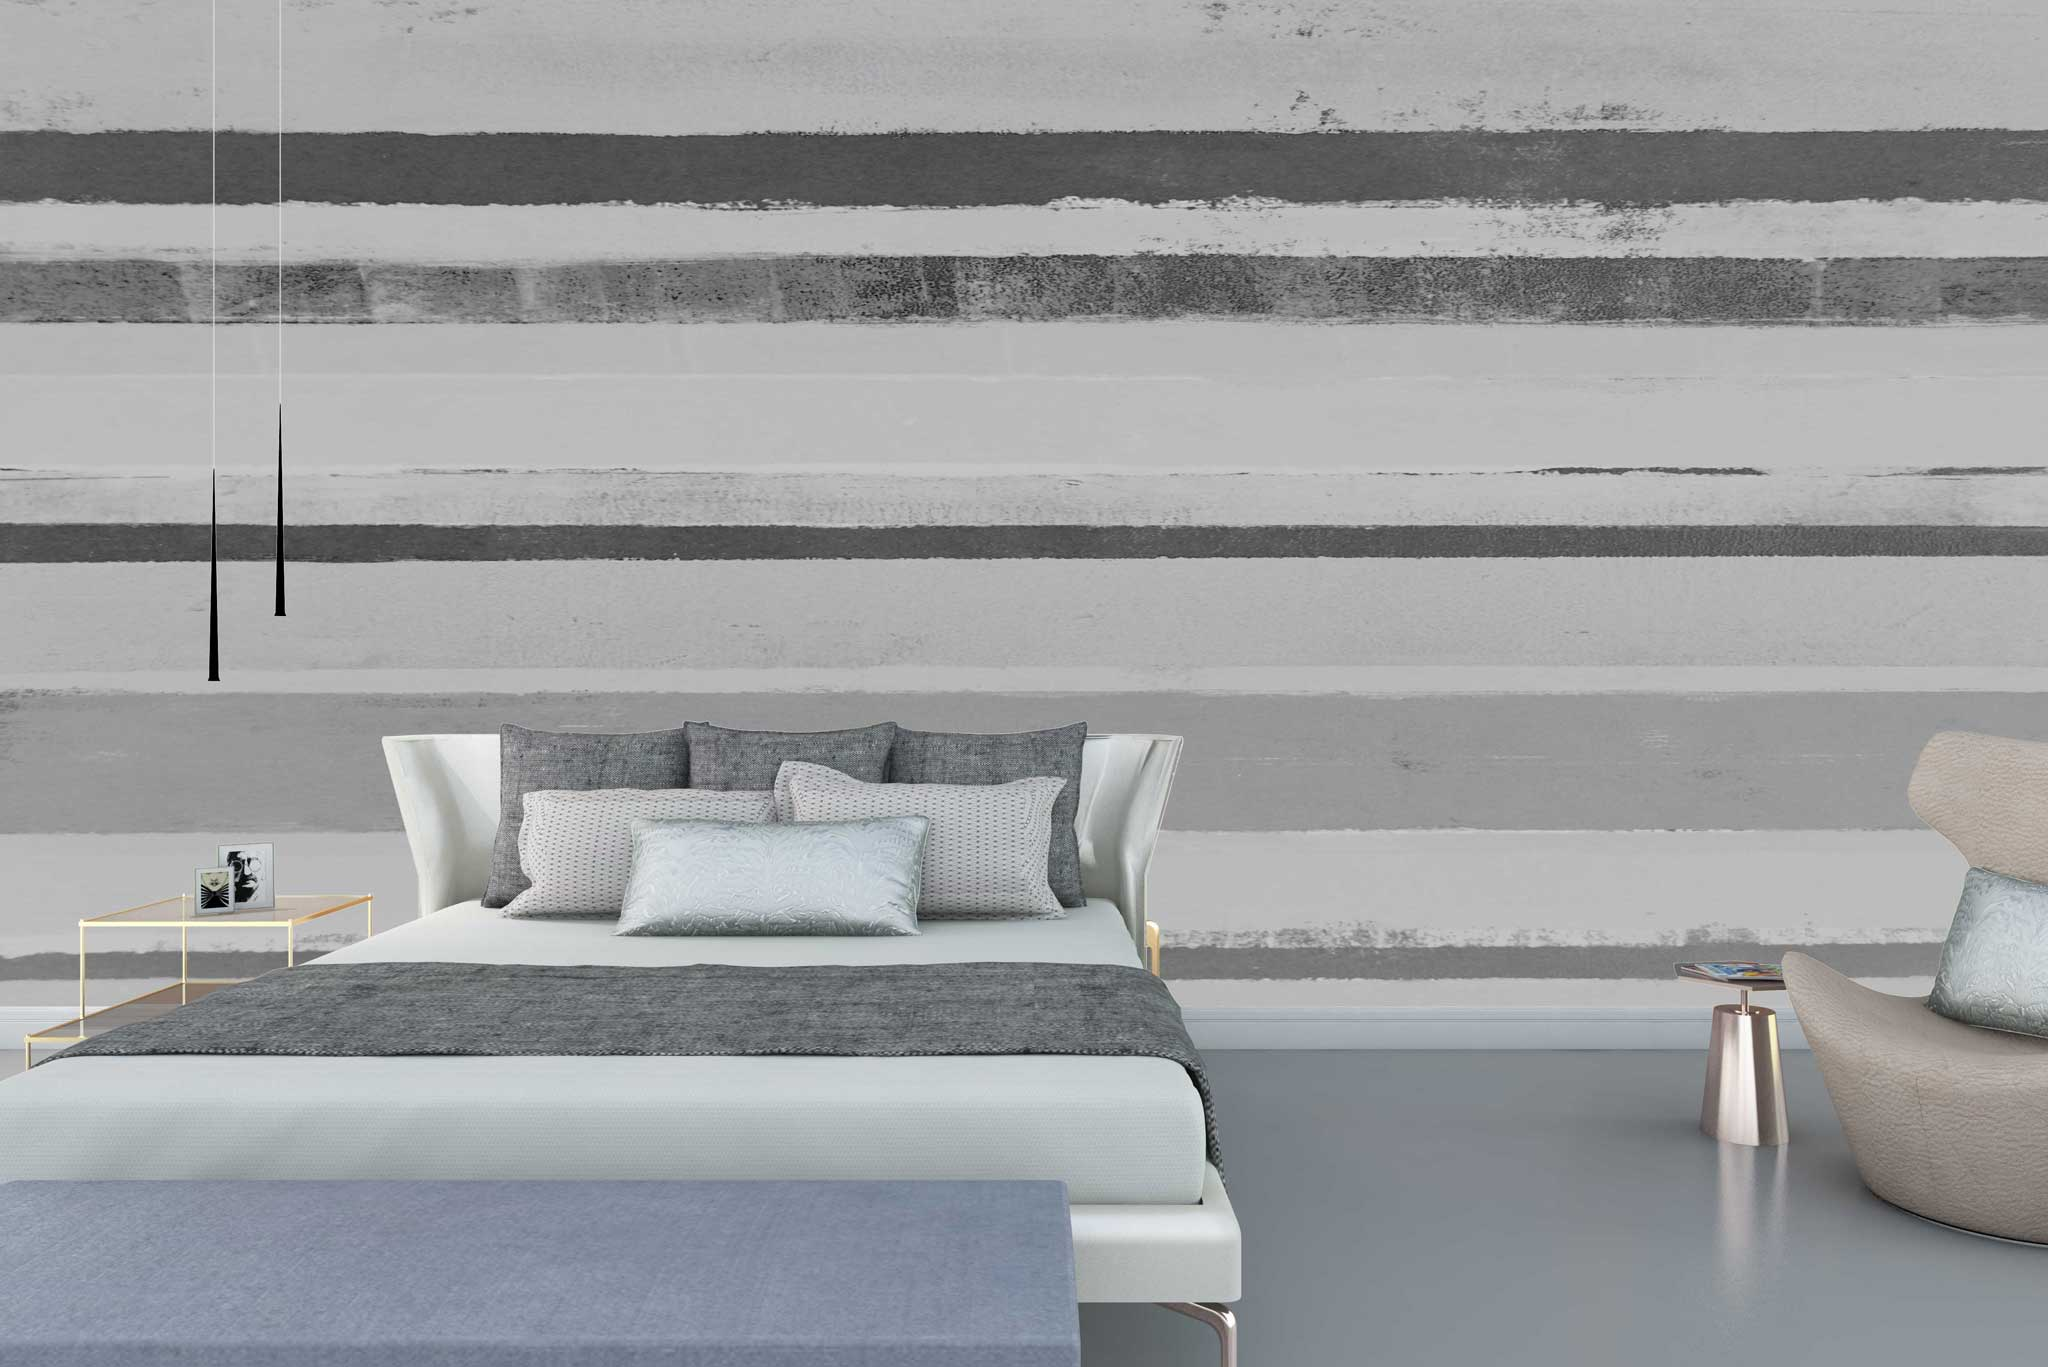 tapet-fototapet-comanda-personalizat-bucuresti-perete-special-lux-model-desen-grafic-abstract-dungi-orizontale-gri